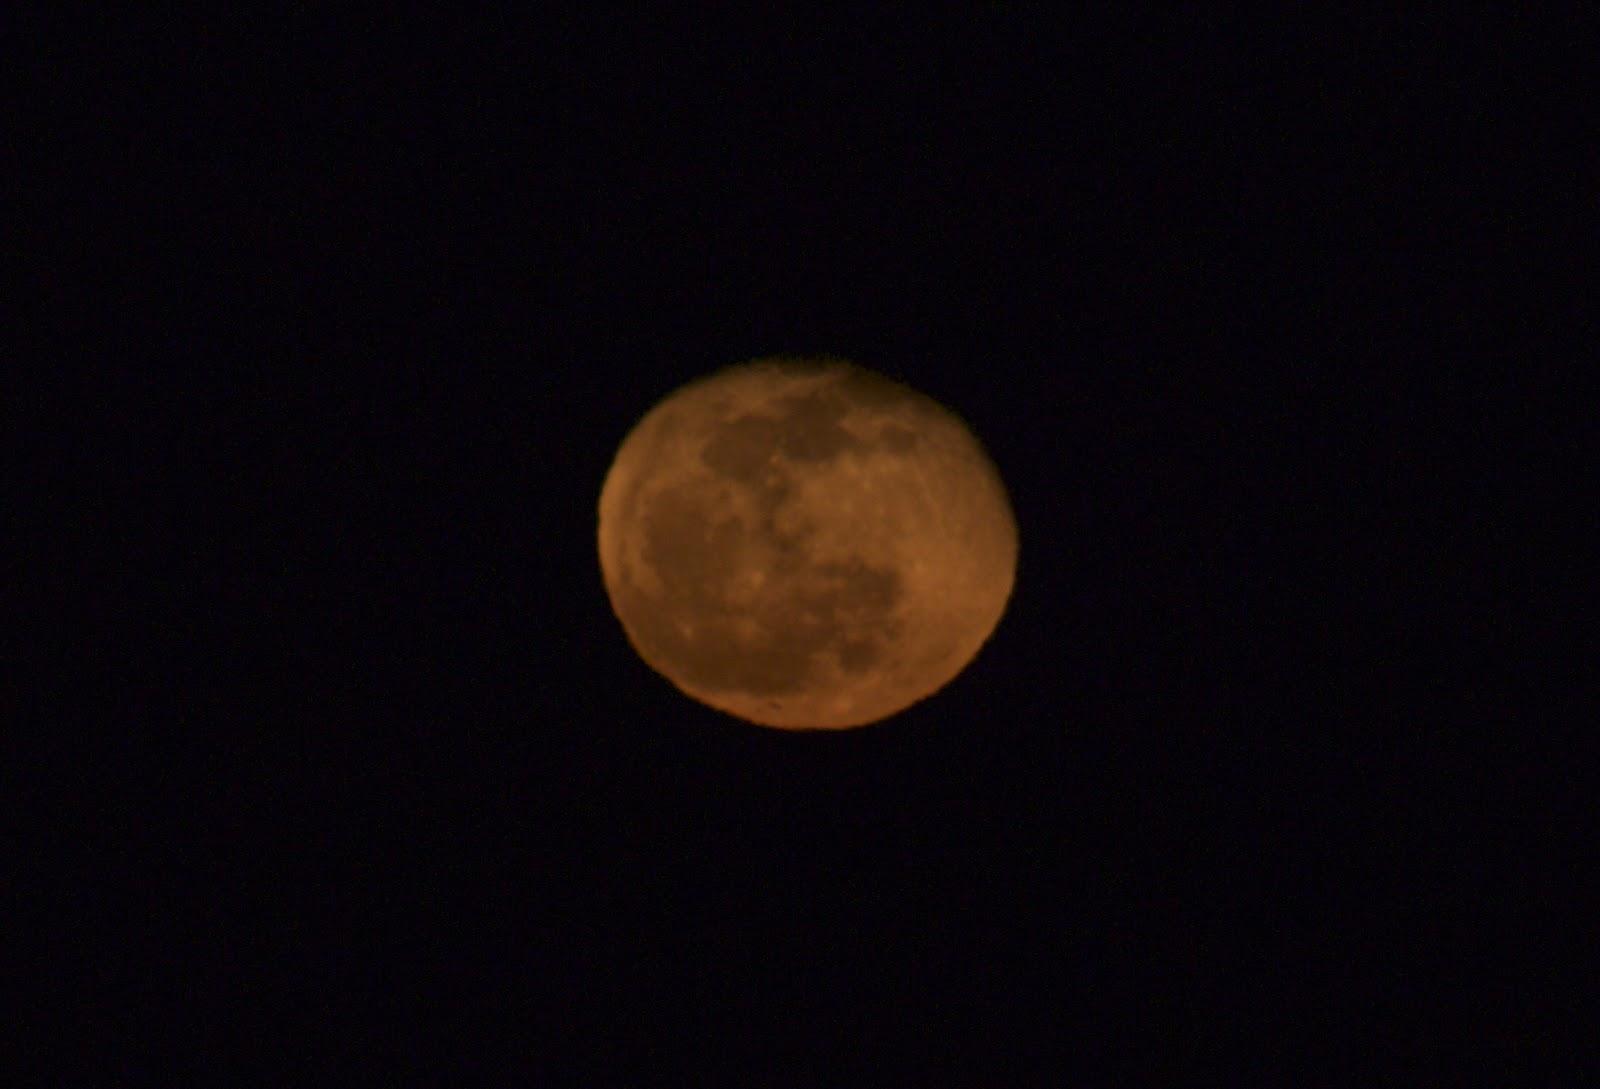 orange moon 1/15 sec